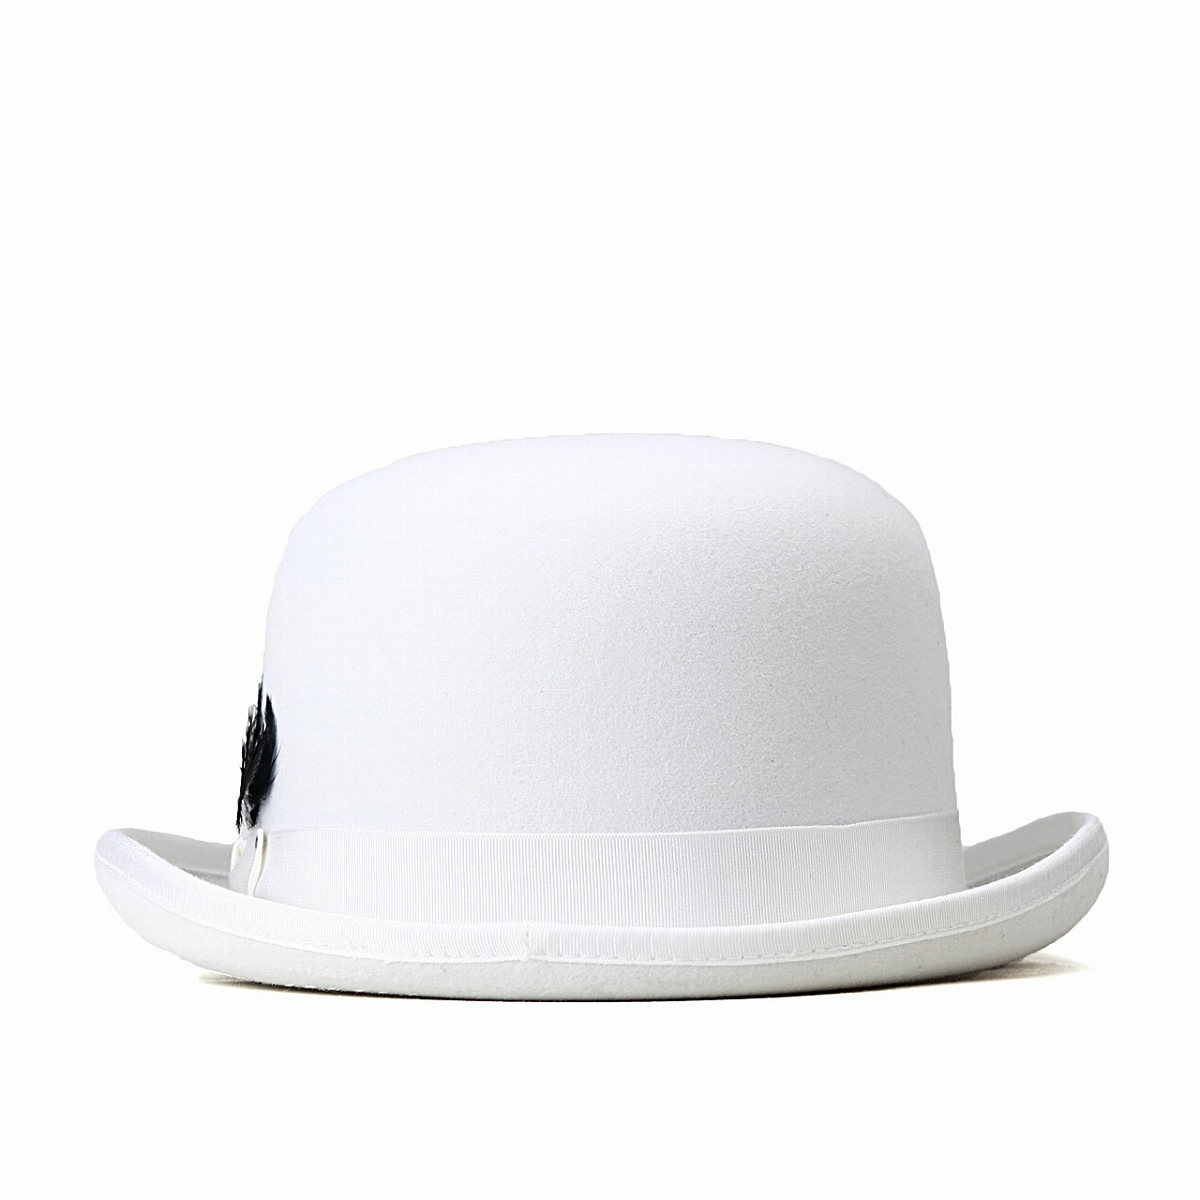 b6bb5545 ELEHELM HAT STORE: Derby hat Bailey wool felt hat bowler hat Bailey ...